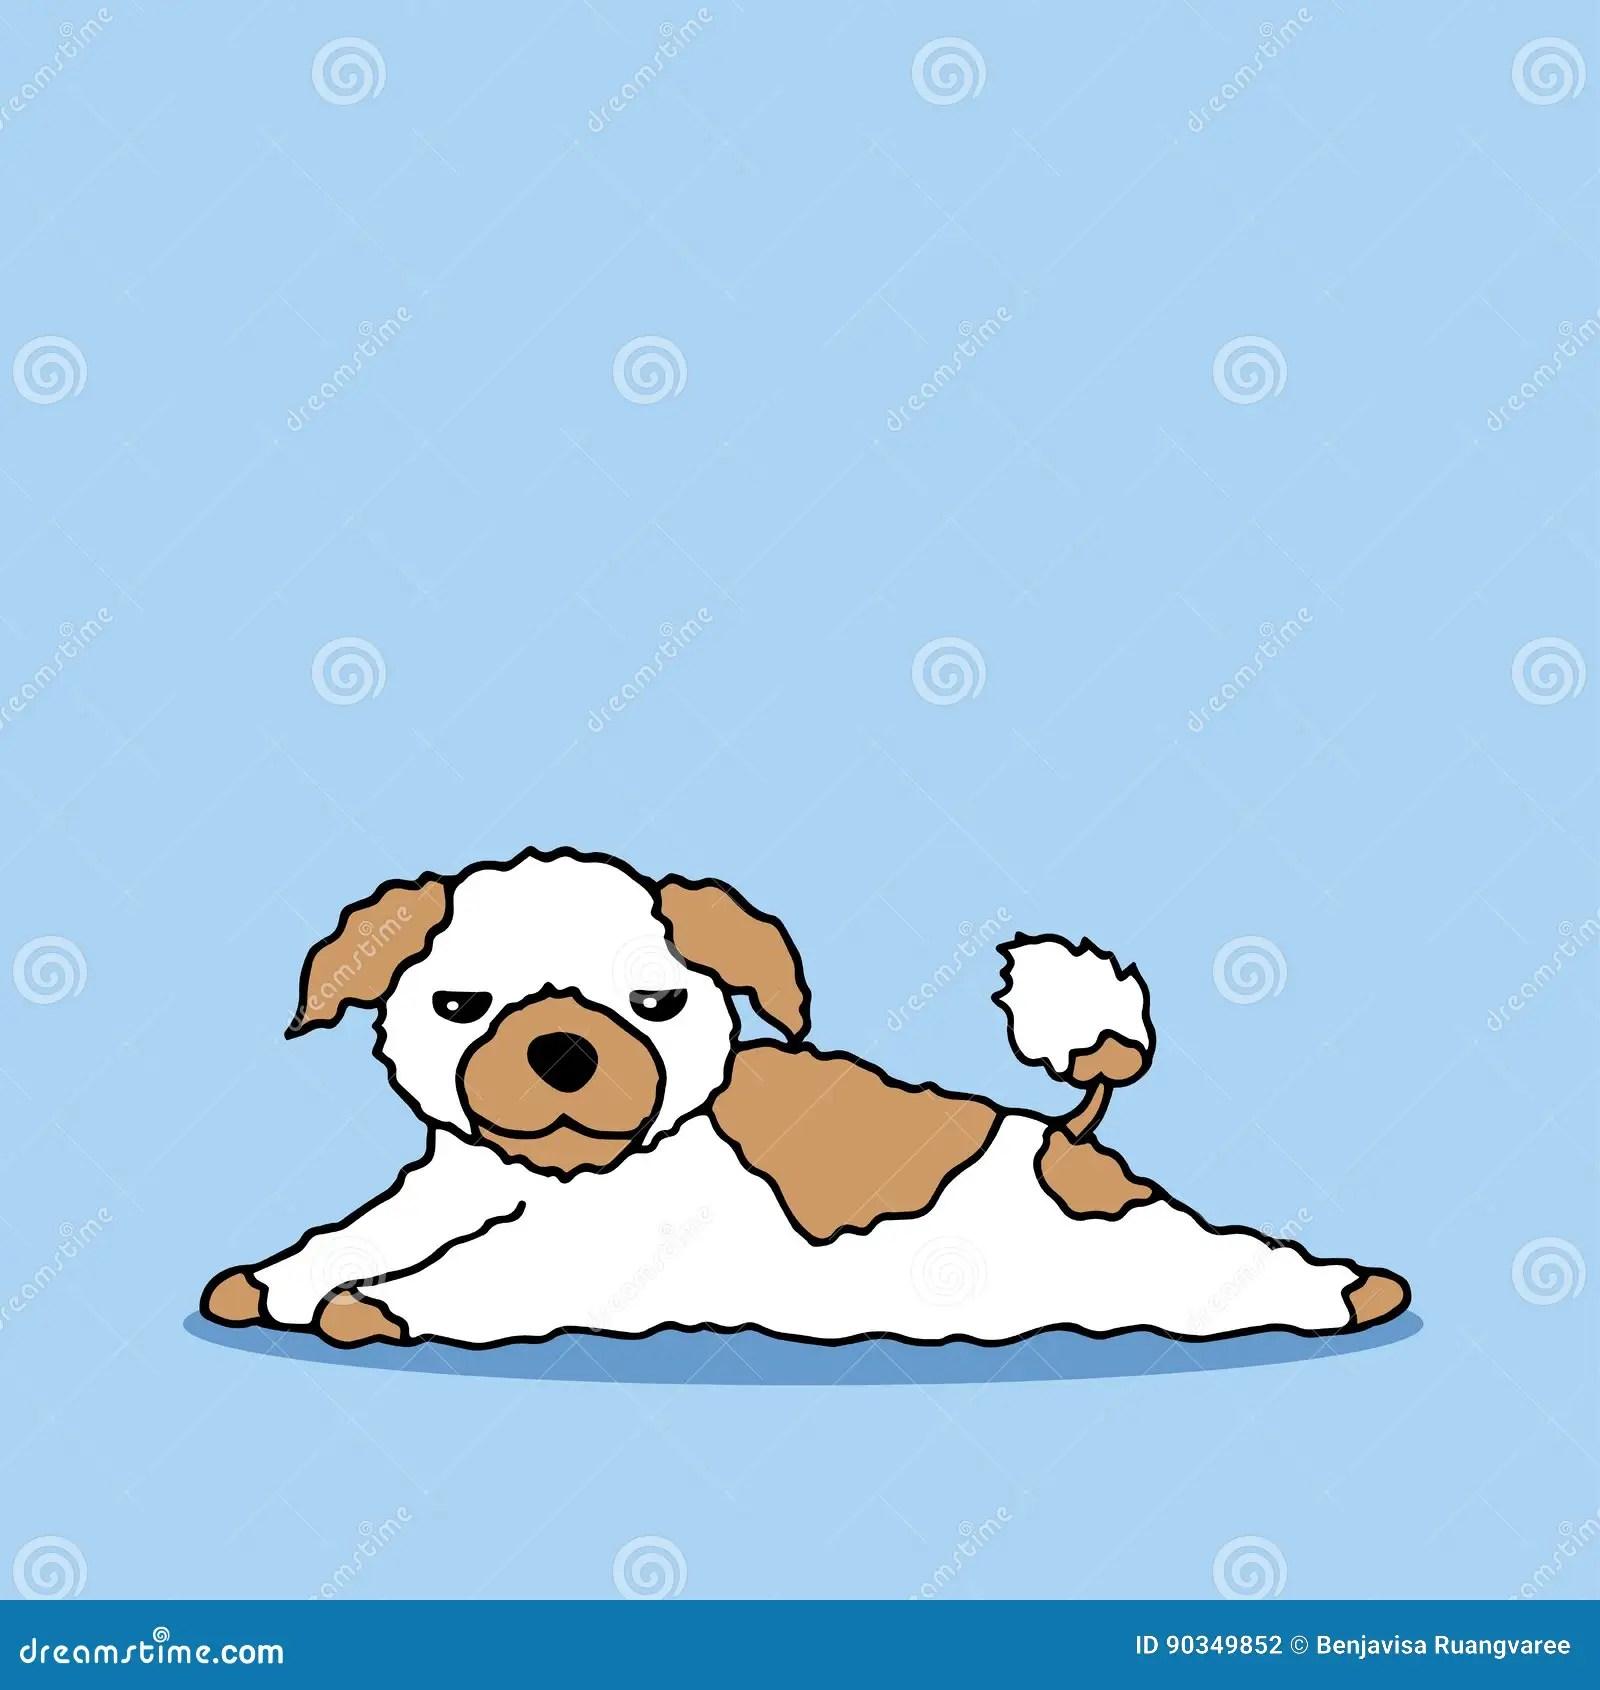 hight resolution of funny sleepy dog vector hand drawing illustration design funny sleepy dog vector hand drawn illustration